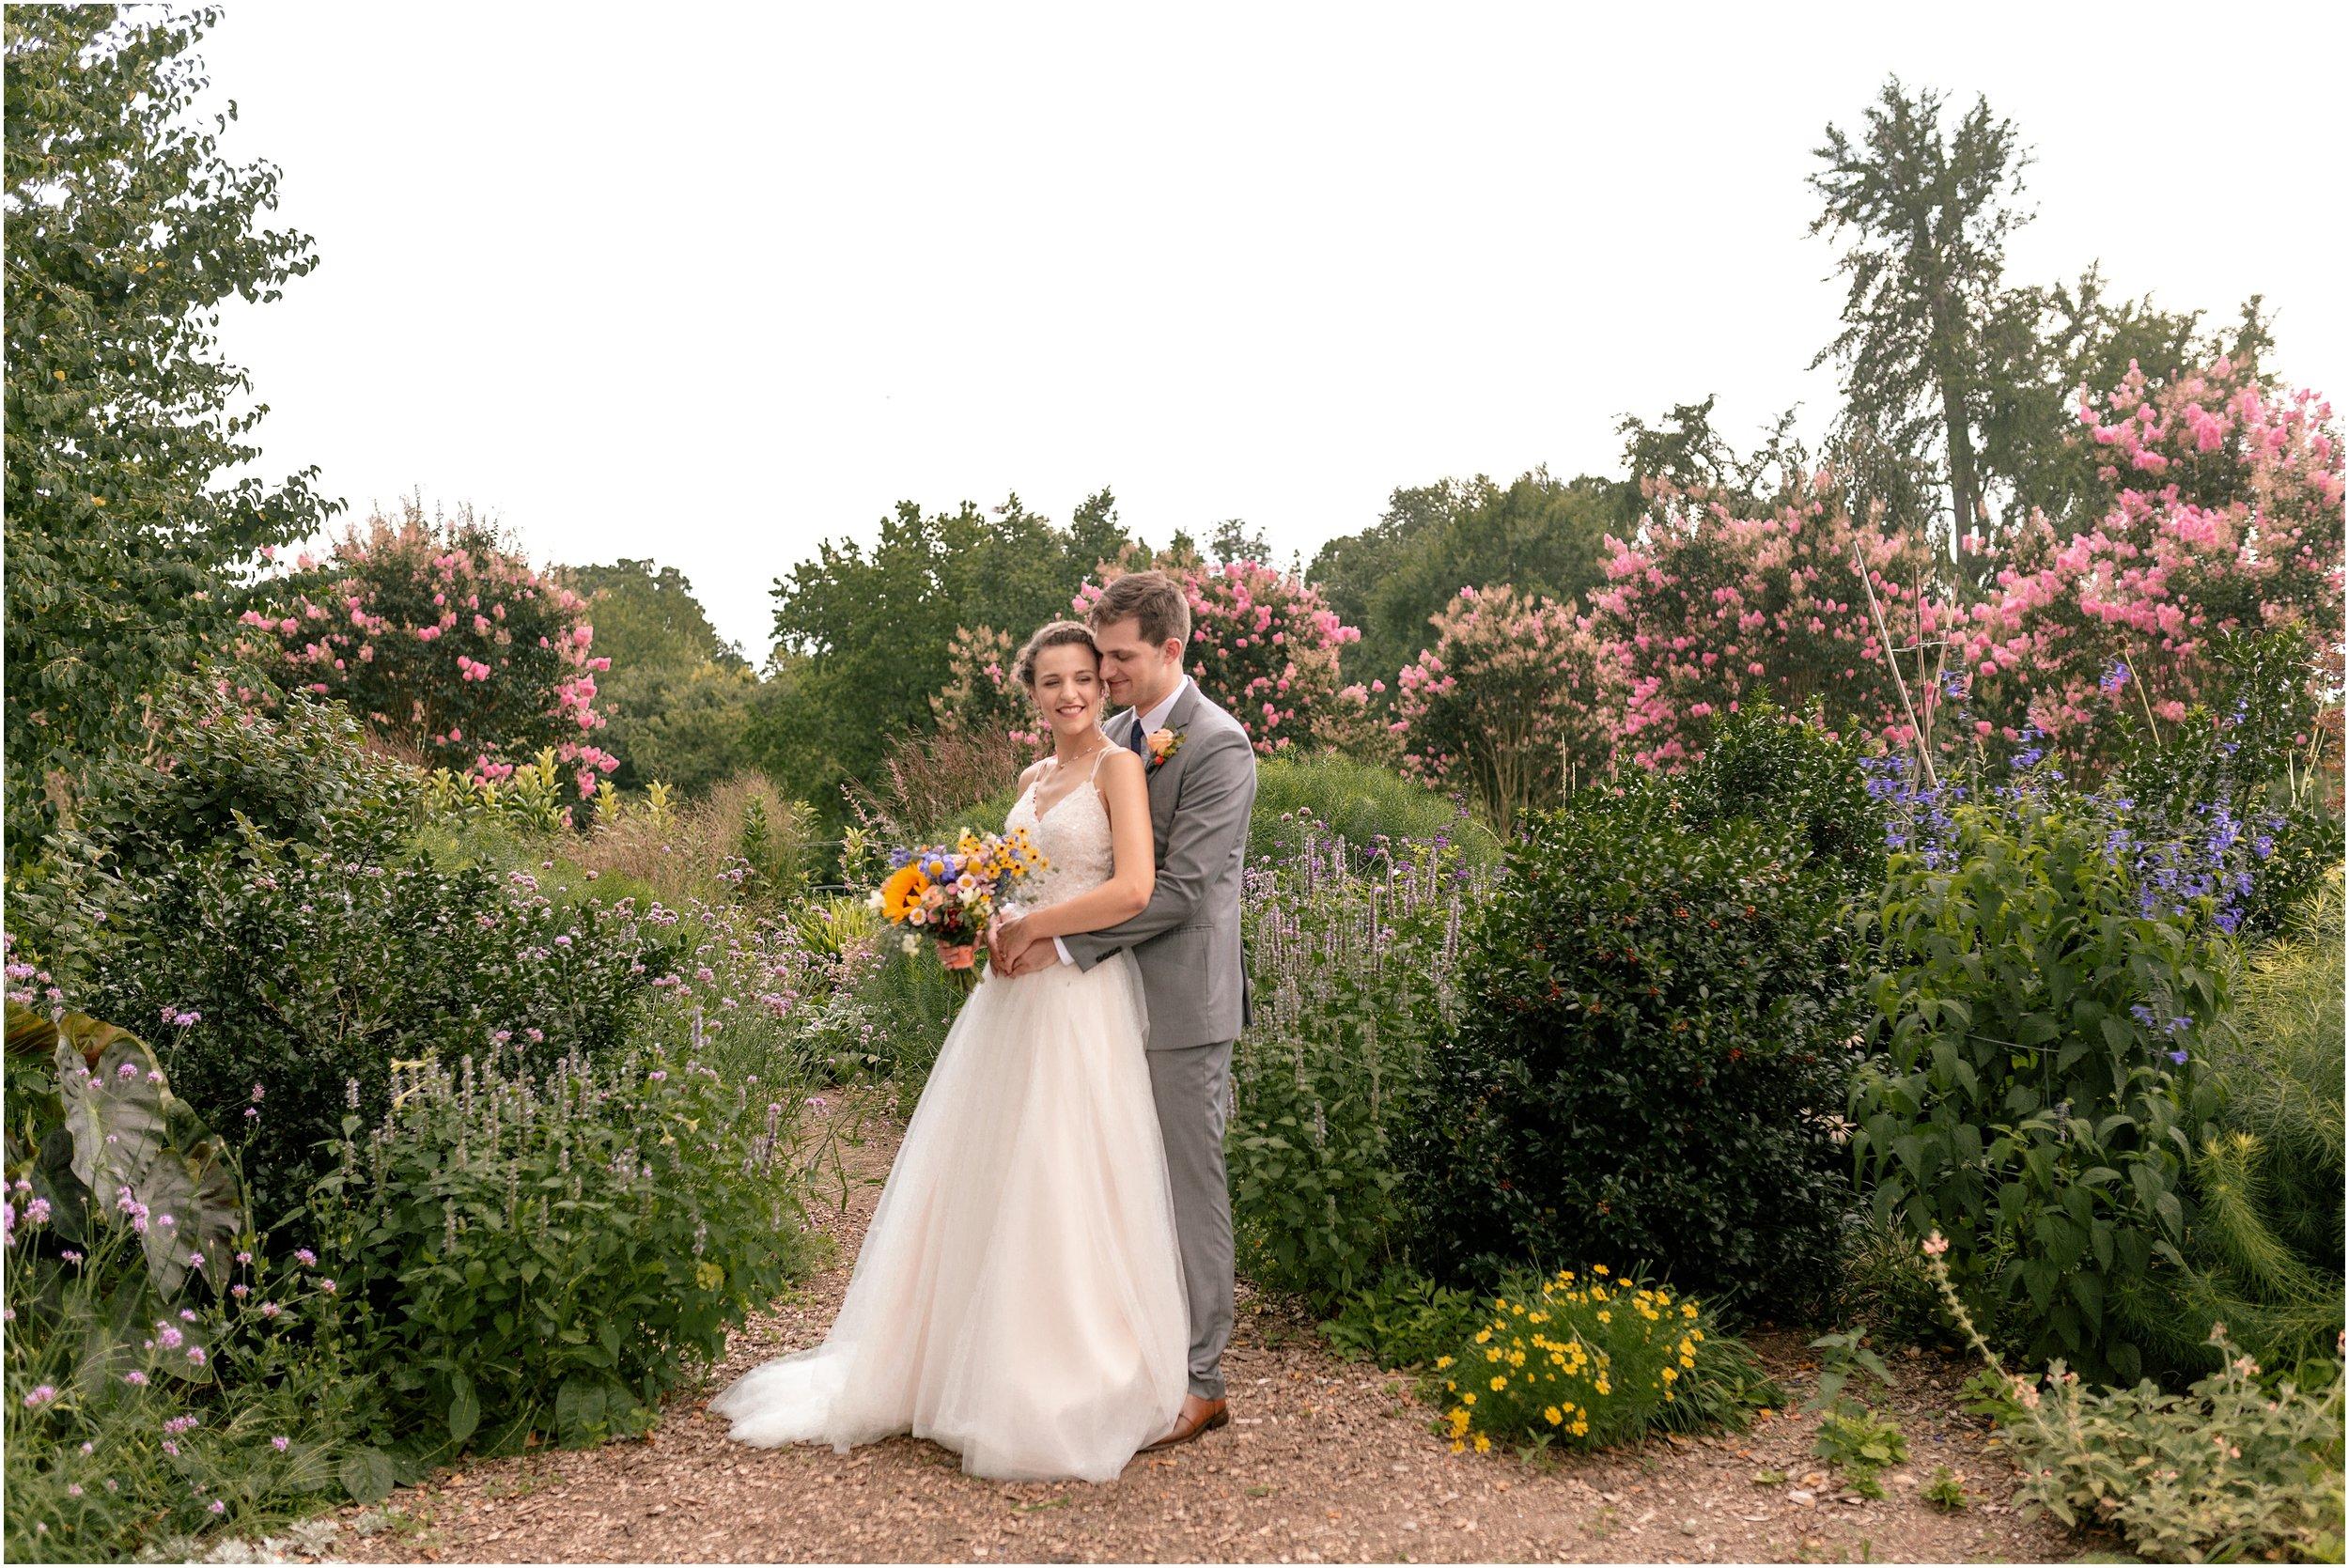 hannah leigh photography Cylburn Arboretum Wedding Baltimore, MD_3422.jpg